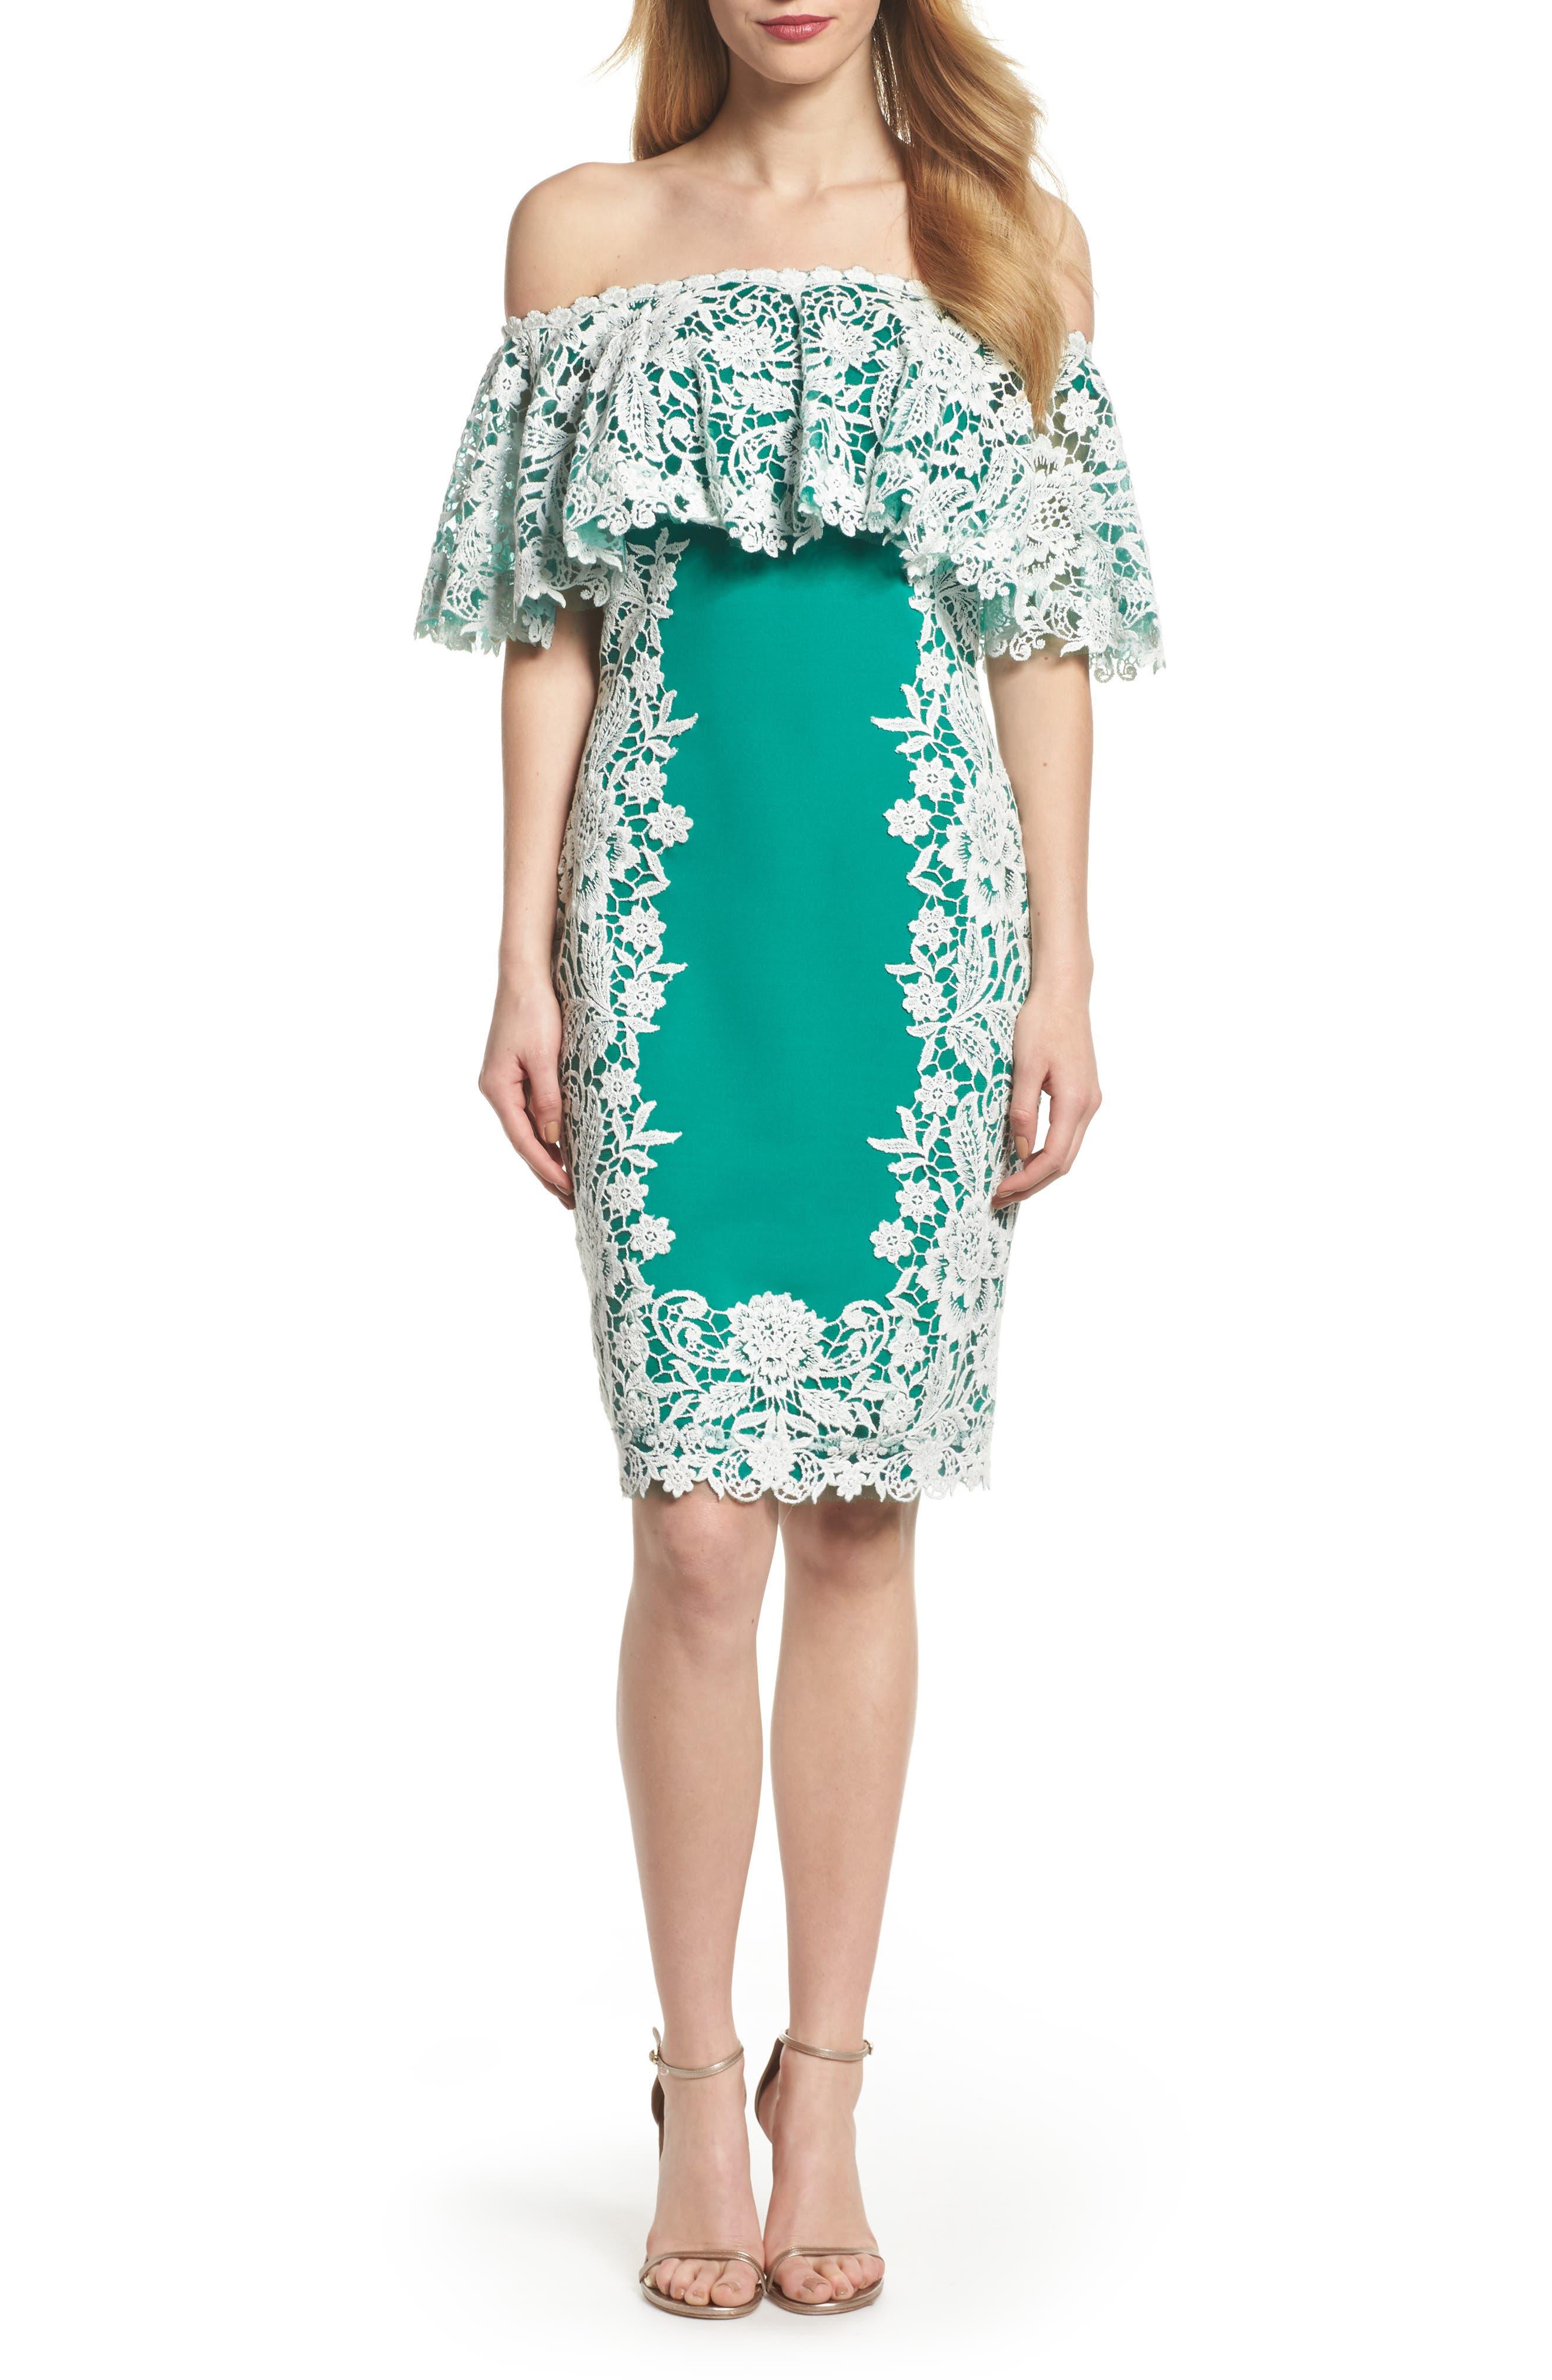 Alternate Image 1 Selected - Tadashi Shoji Off the Shoulder Crochet & Neoprene Dress